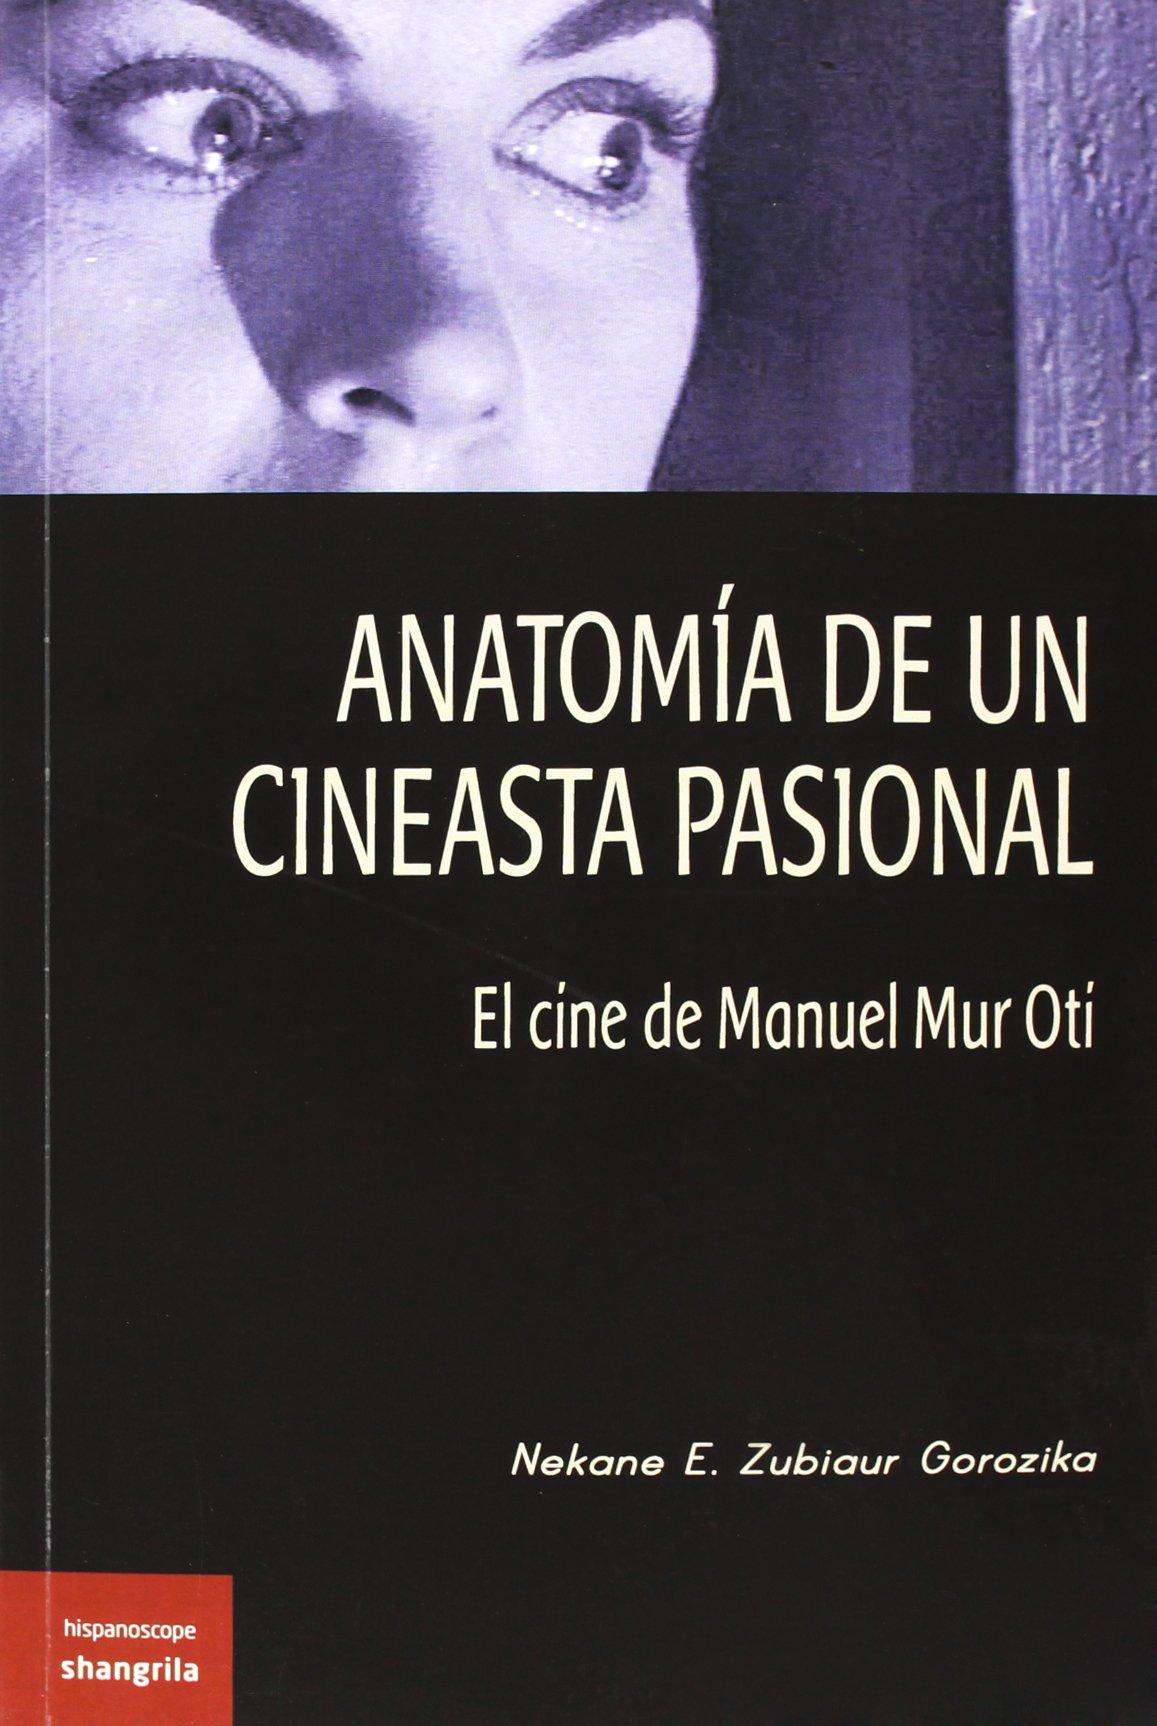 Anatomía de un cineasta pasional : el cine de Manuel Mur Oti